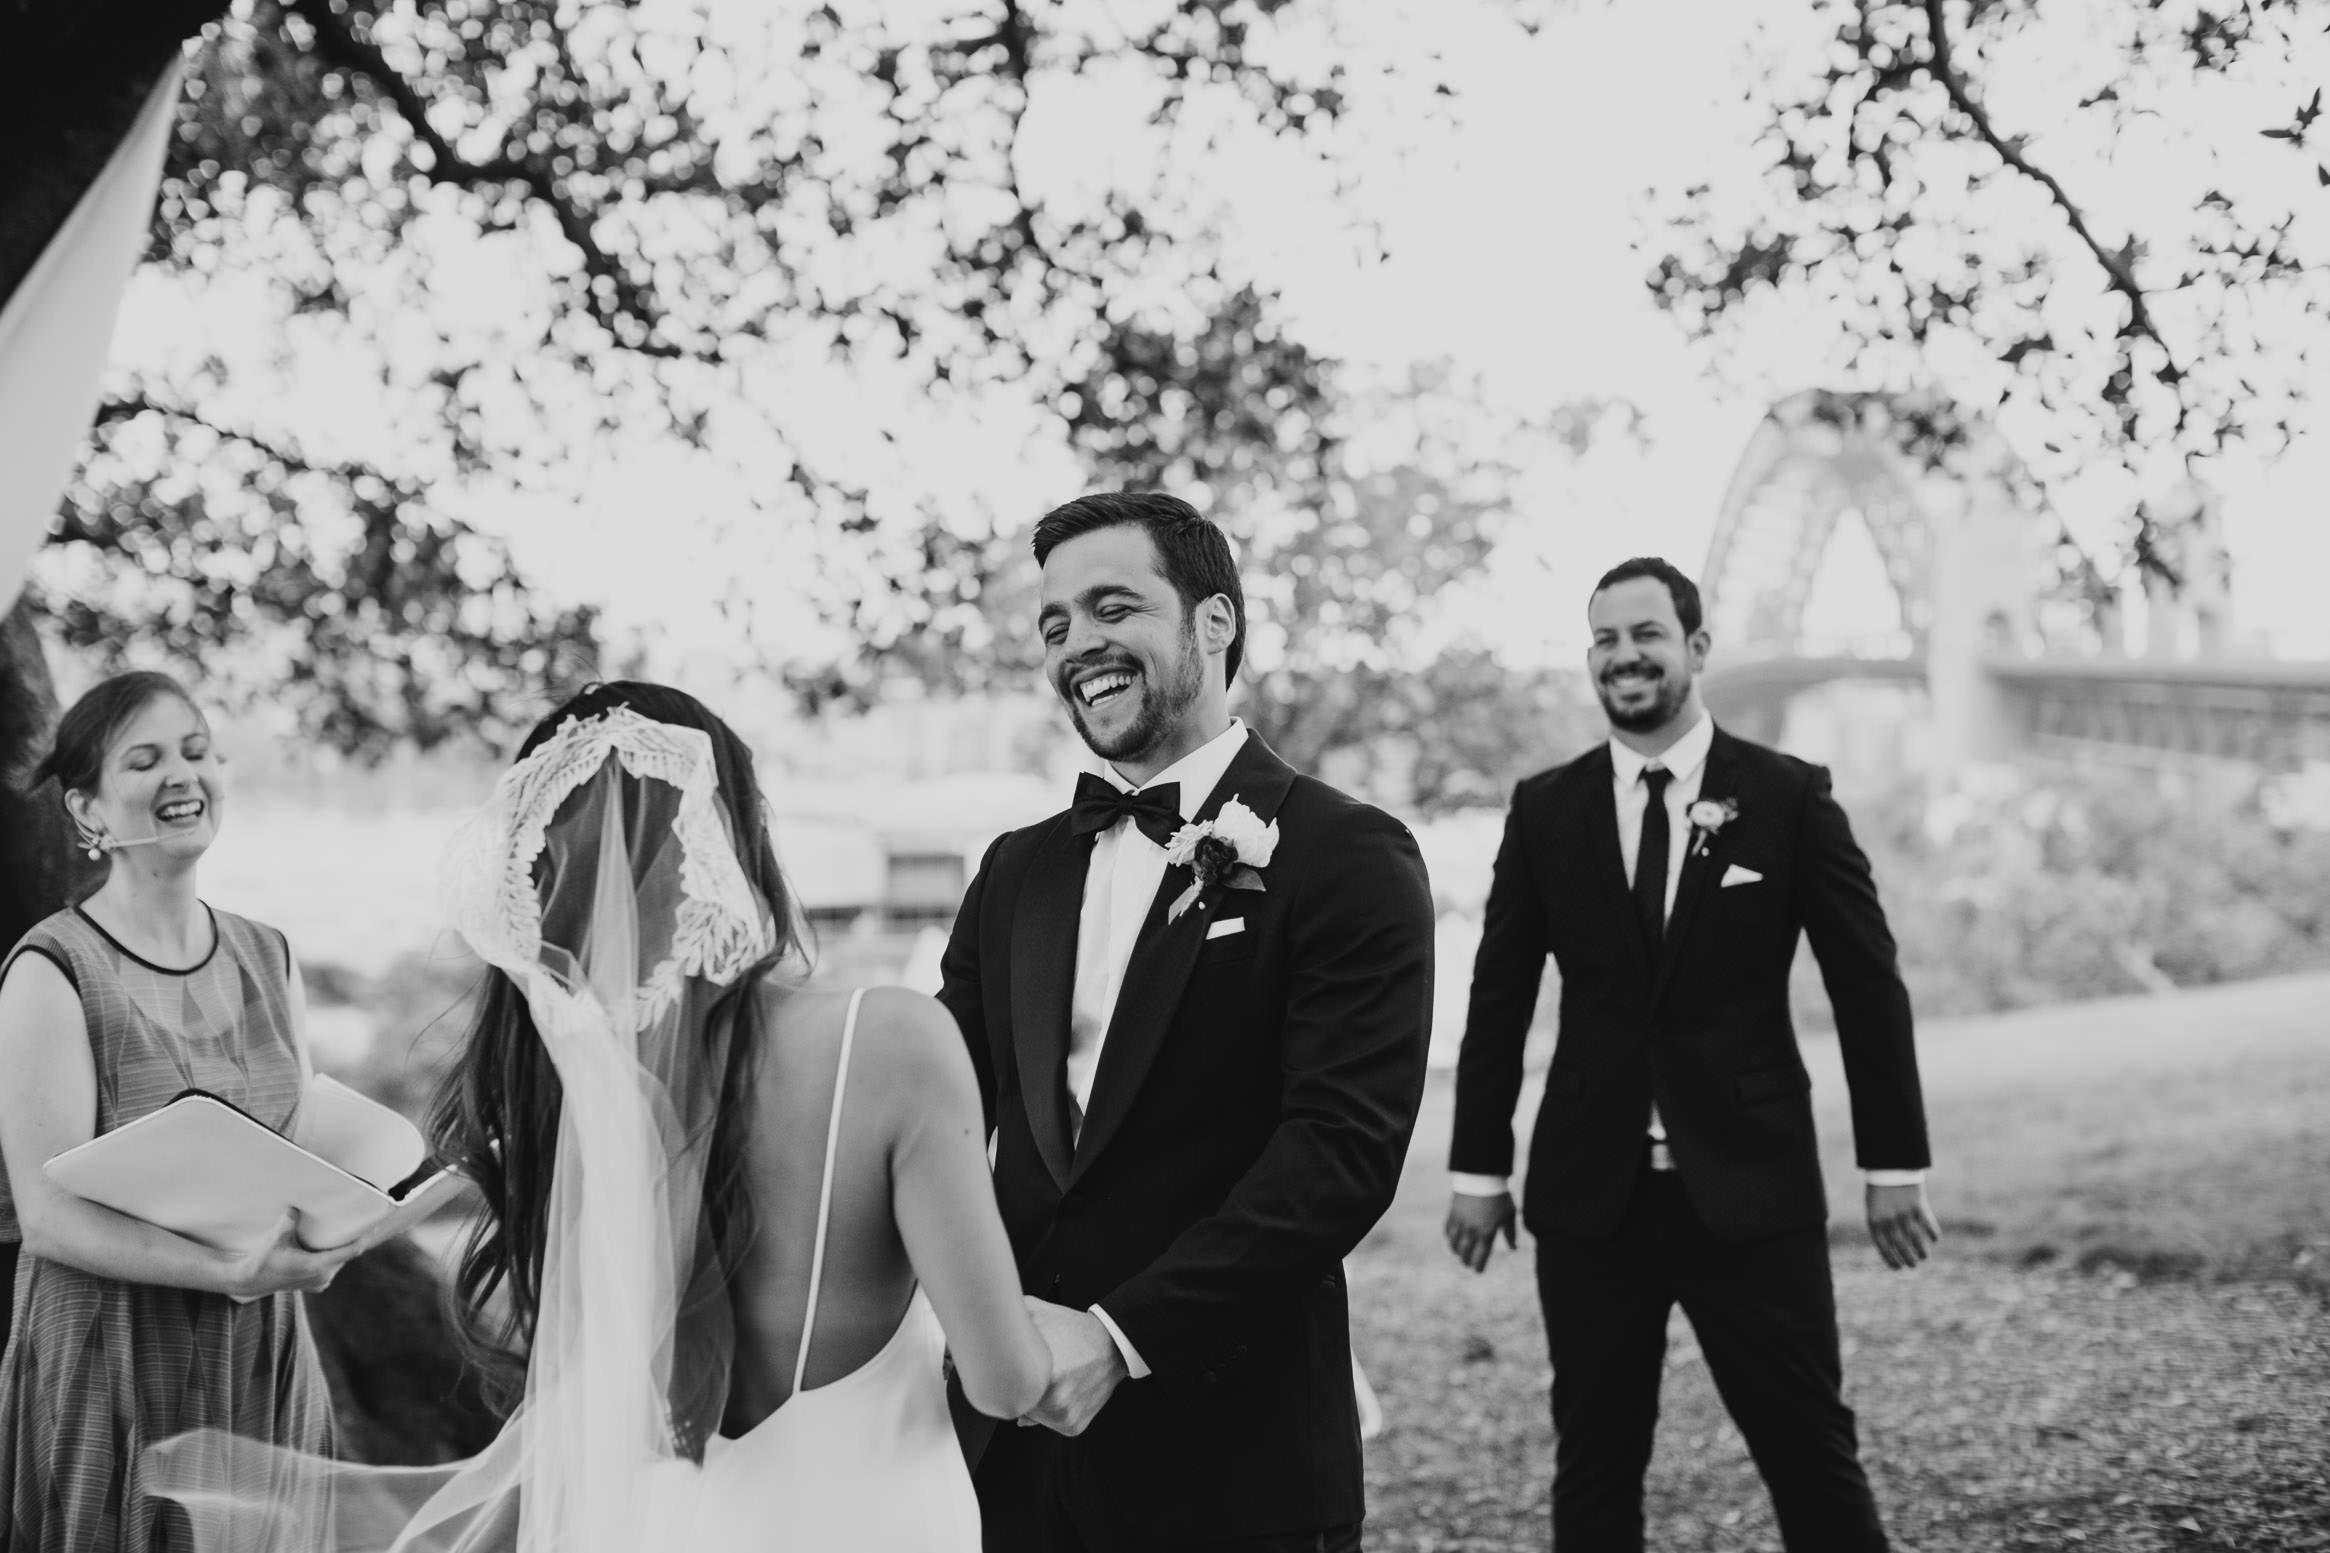 151122_justinaaron_wedding_anja_camilo_pr-53.jpg